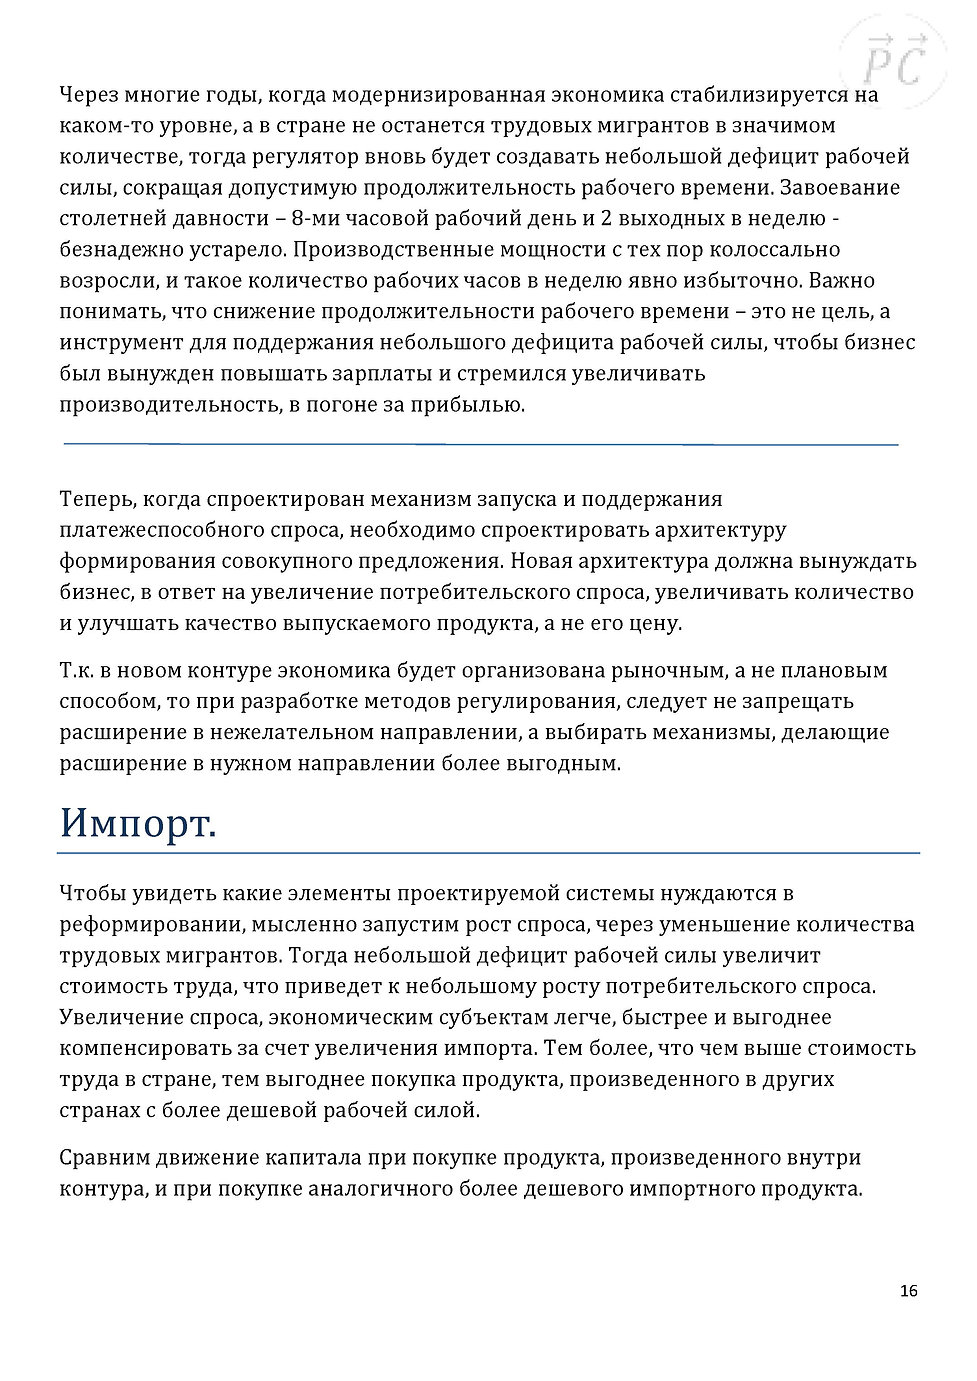 Page_00016.jpg